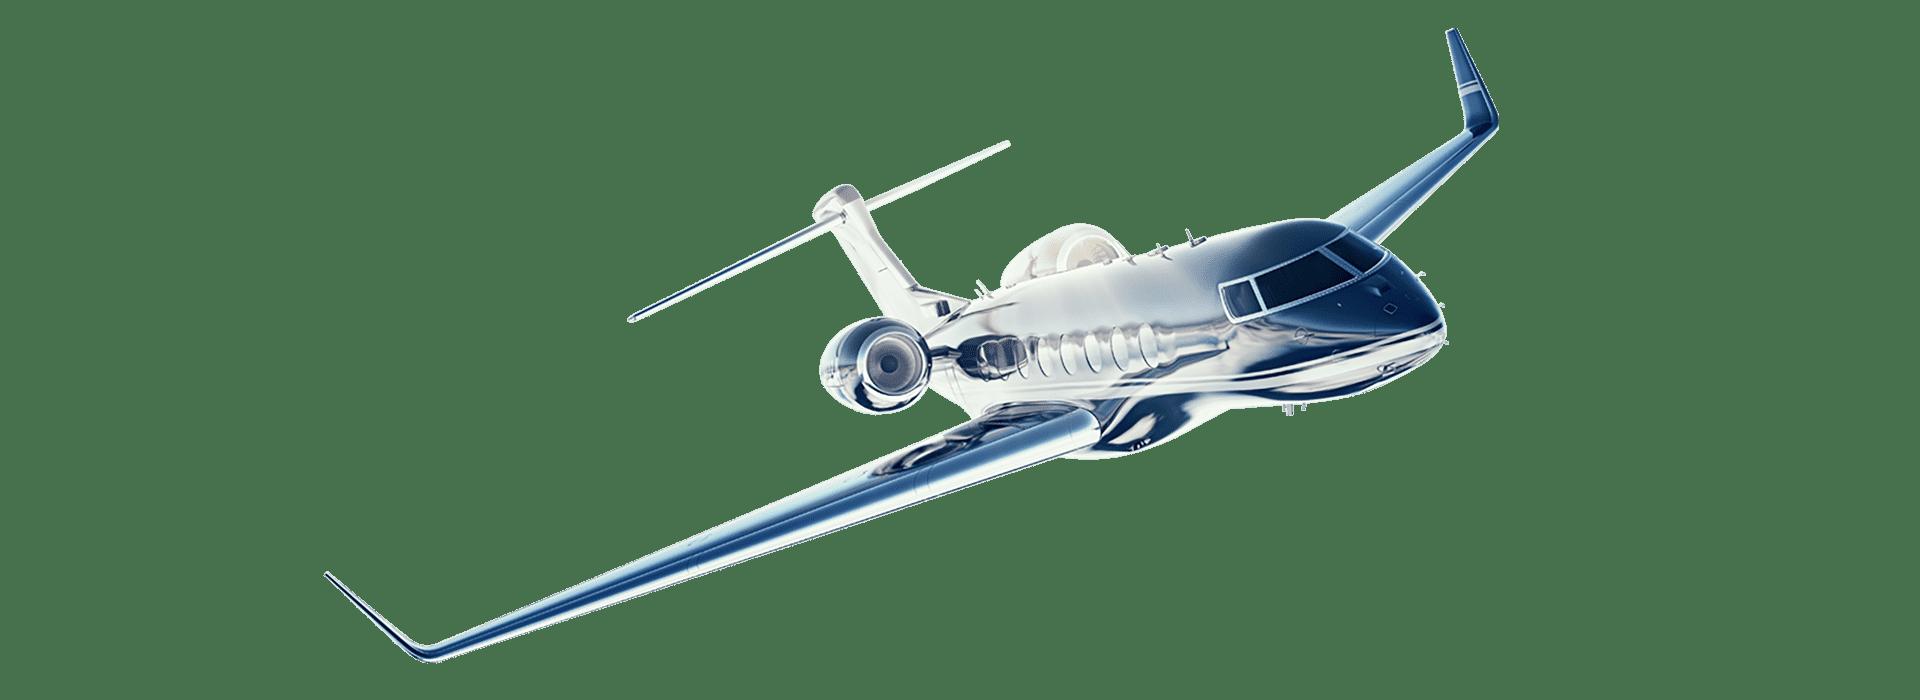 Business-Jet-0717